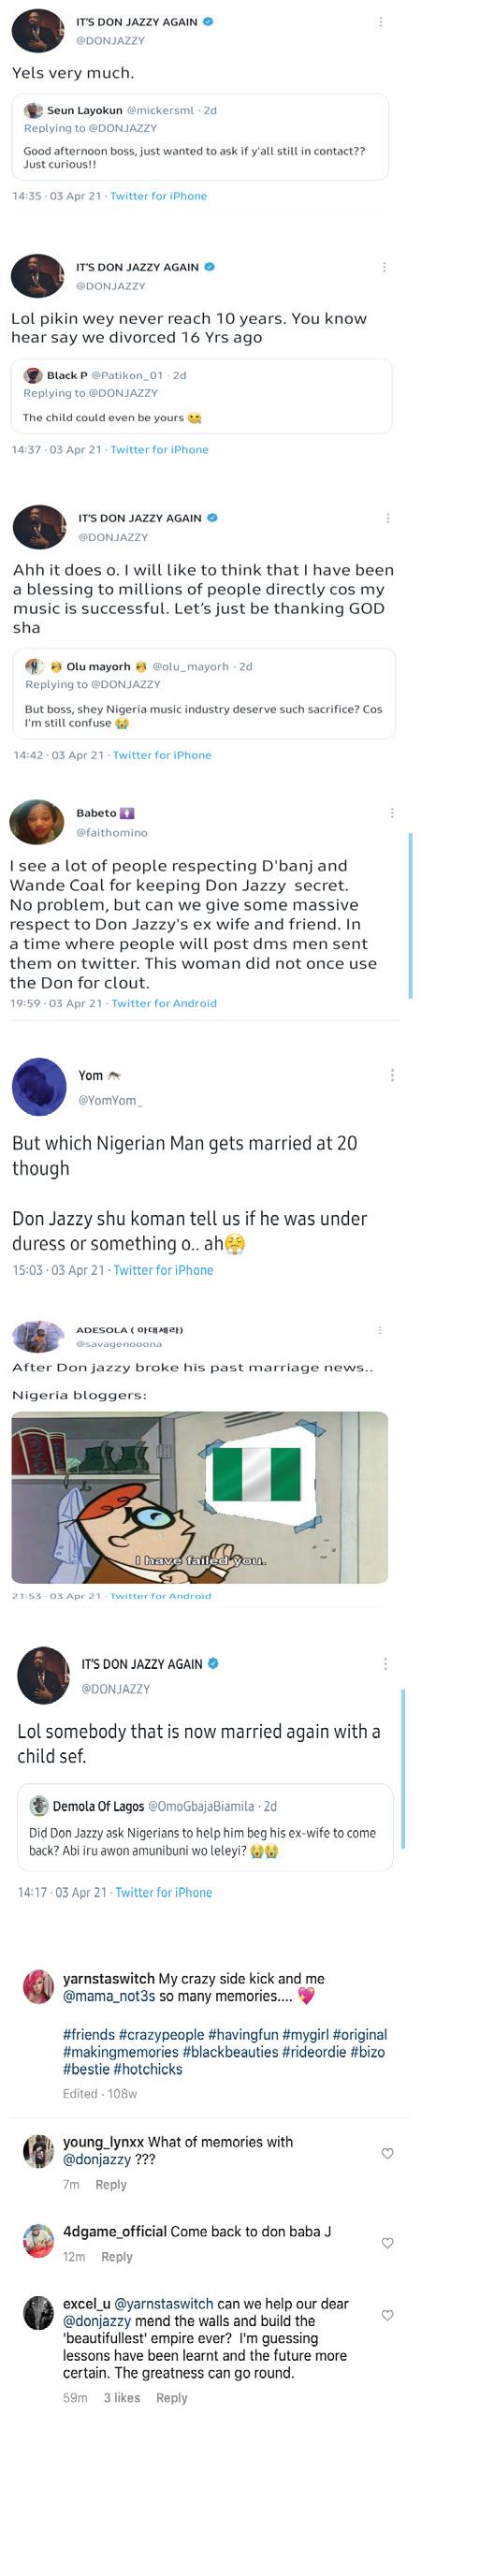 Donjazzy Failed marriage